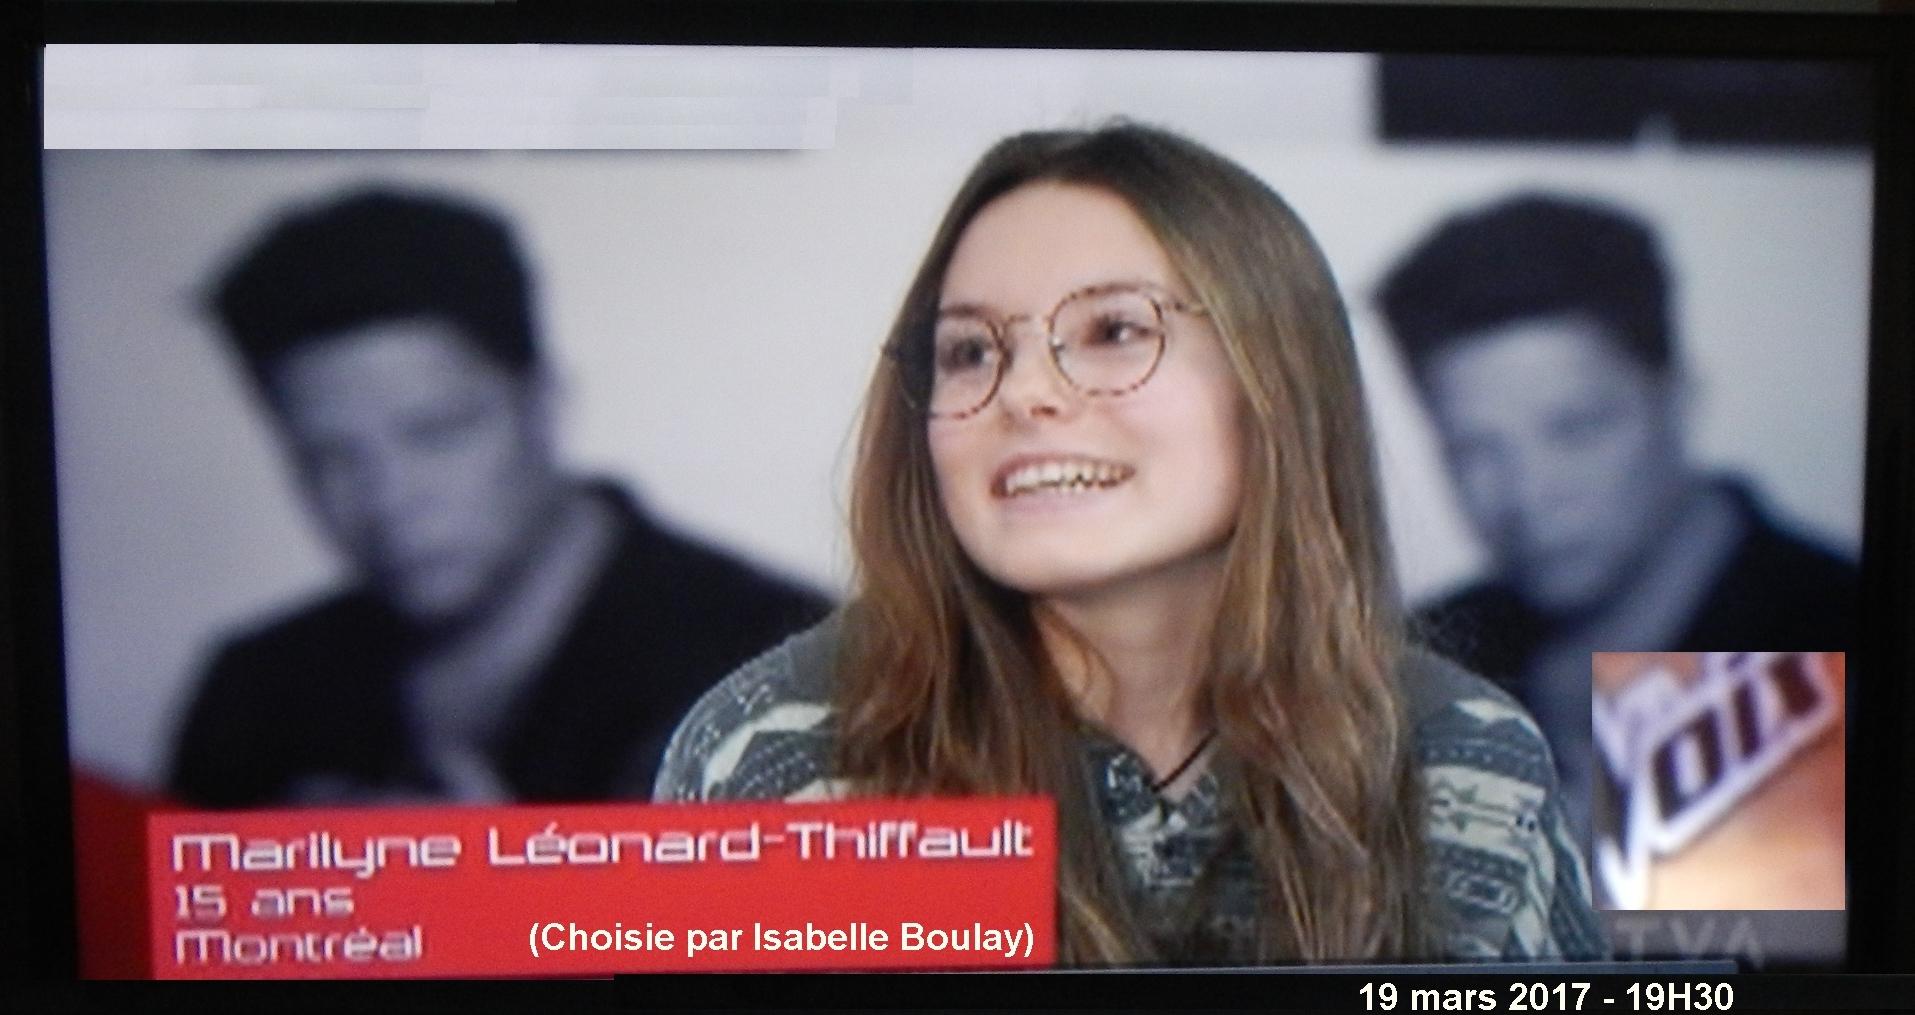 Marilyne-XI Léonard-Thiffault à La Voix